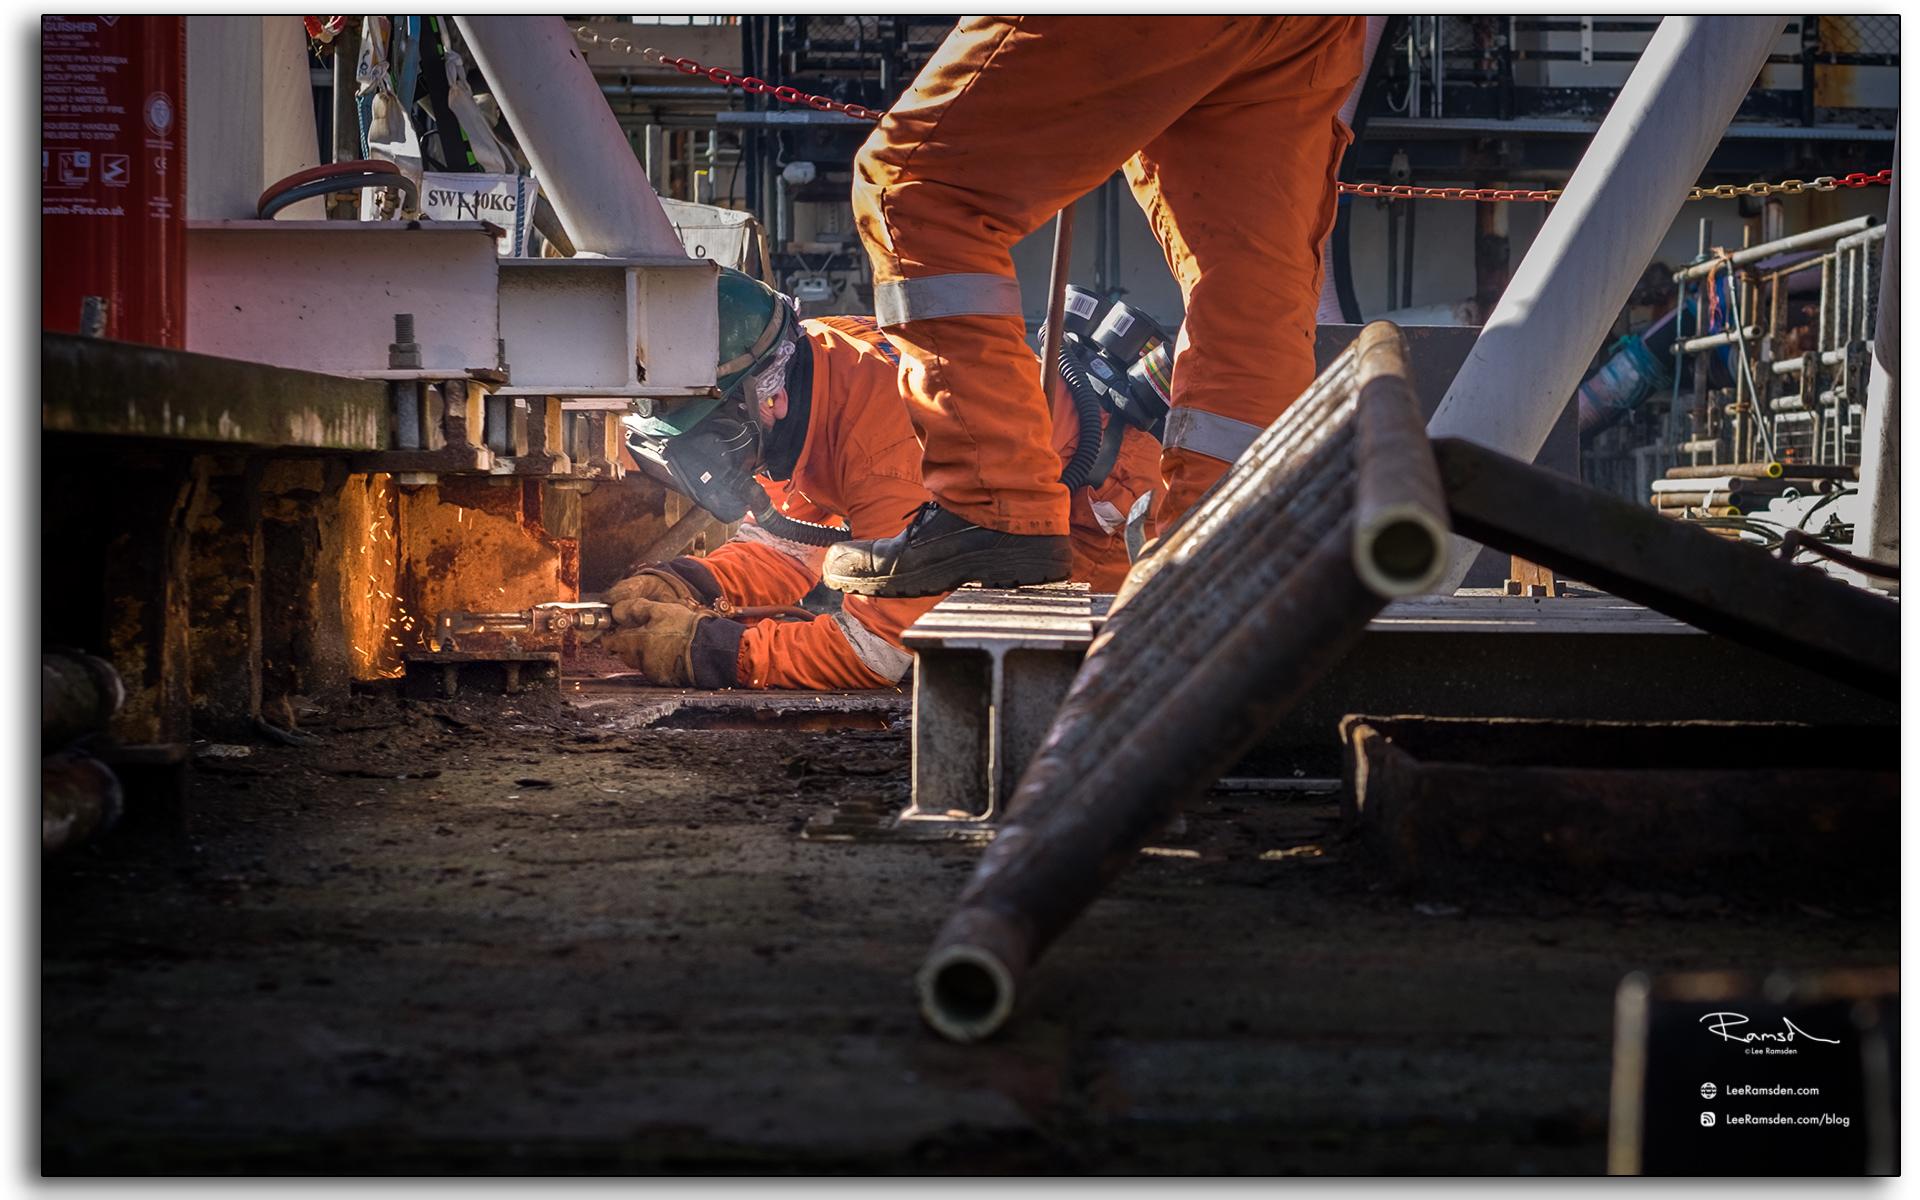 BP Miller, decommissioning, Petrofac, Saipem, BP, buring, oxygen, acetylene, rig removal, cutting, burning, industrial, north sea, photo taken by Lee Ramsden